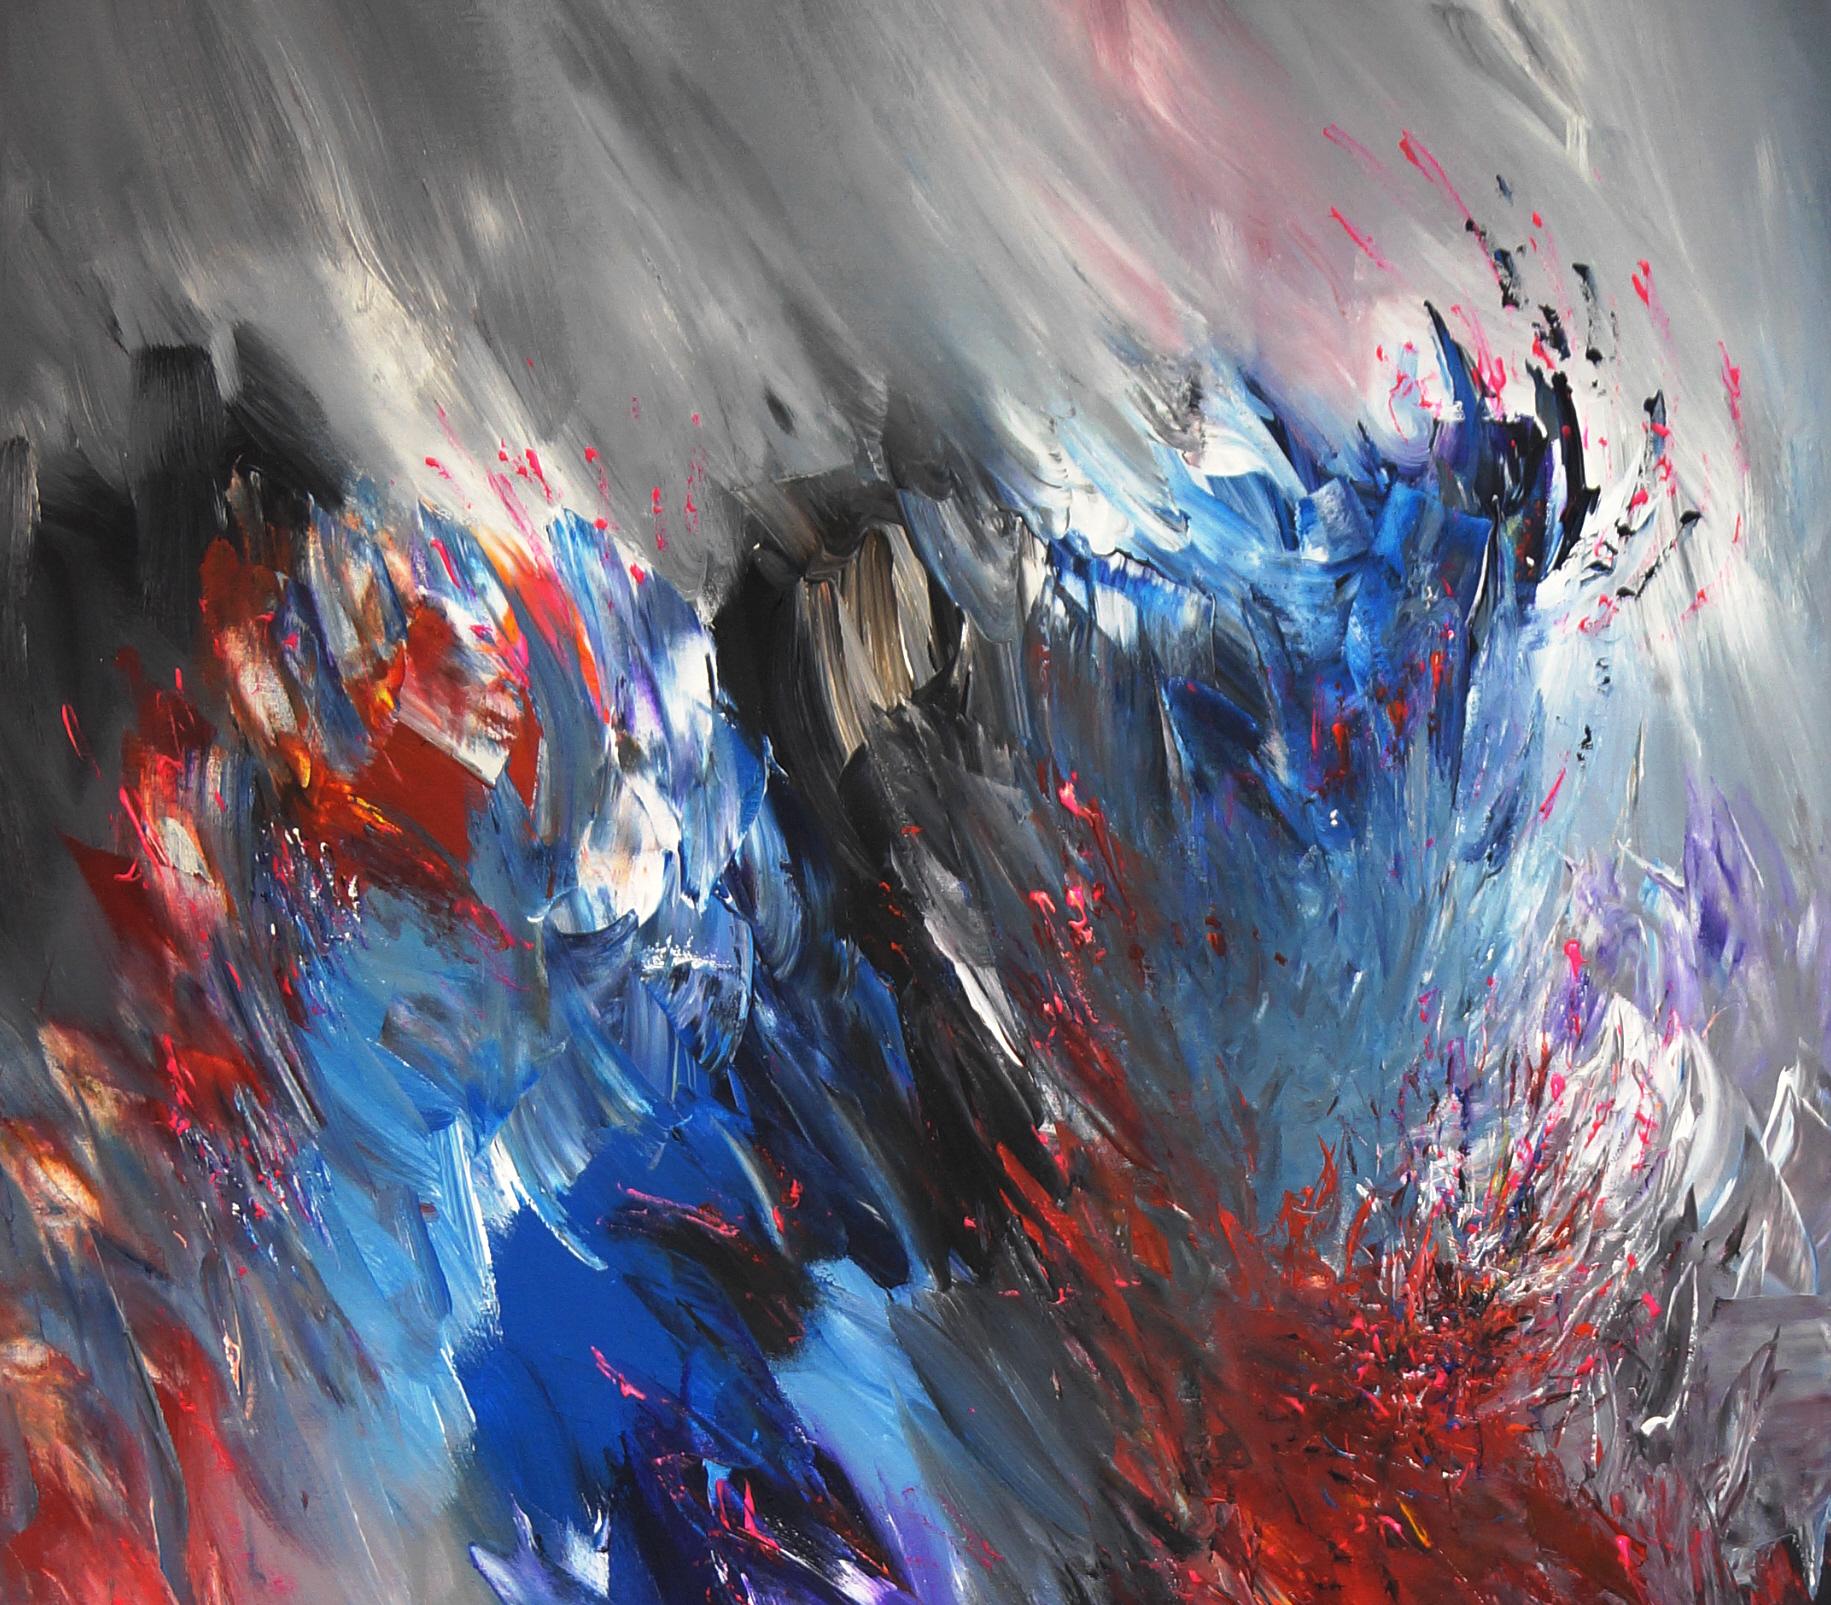 Abstraktes Acrylbild mit rot. Original Gemälde auf Leinwand.